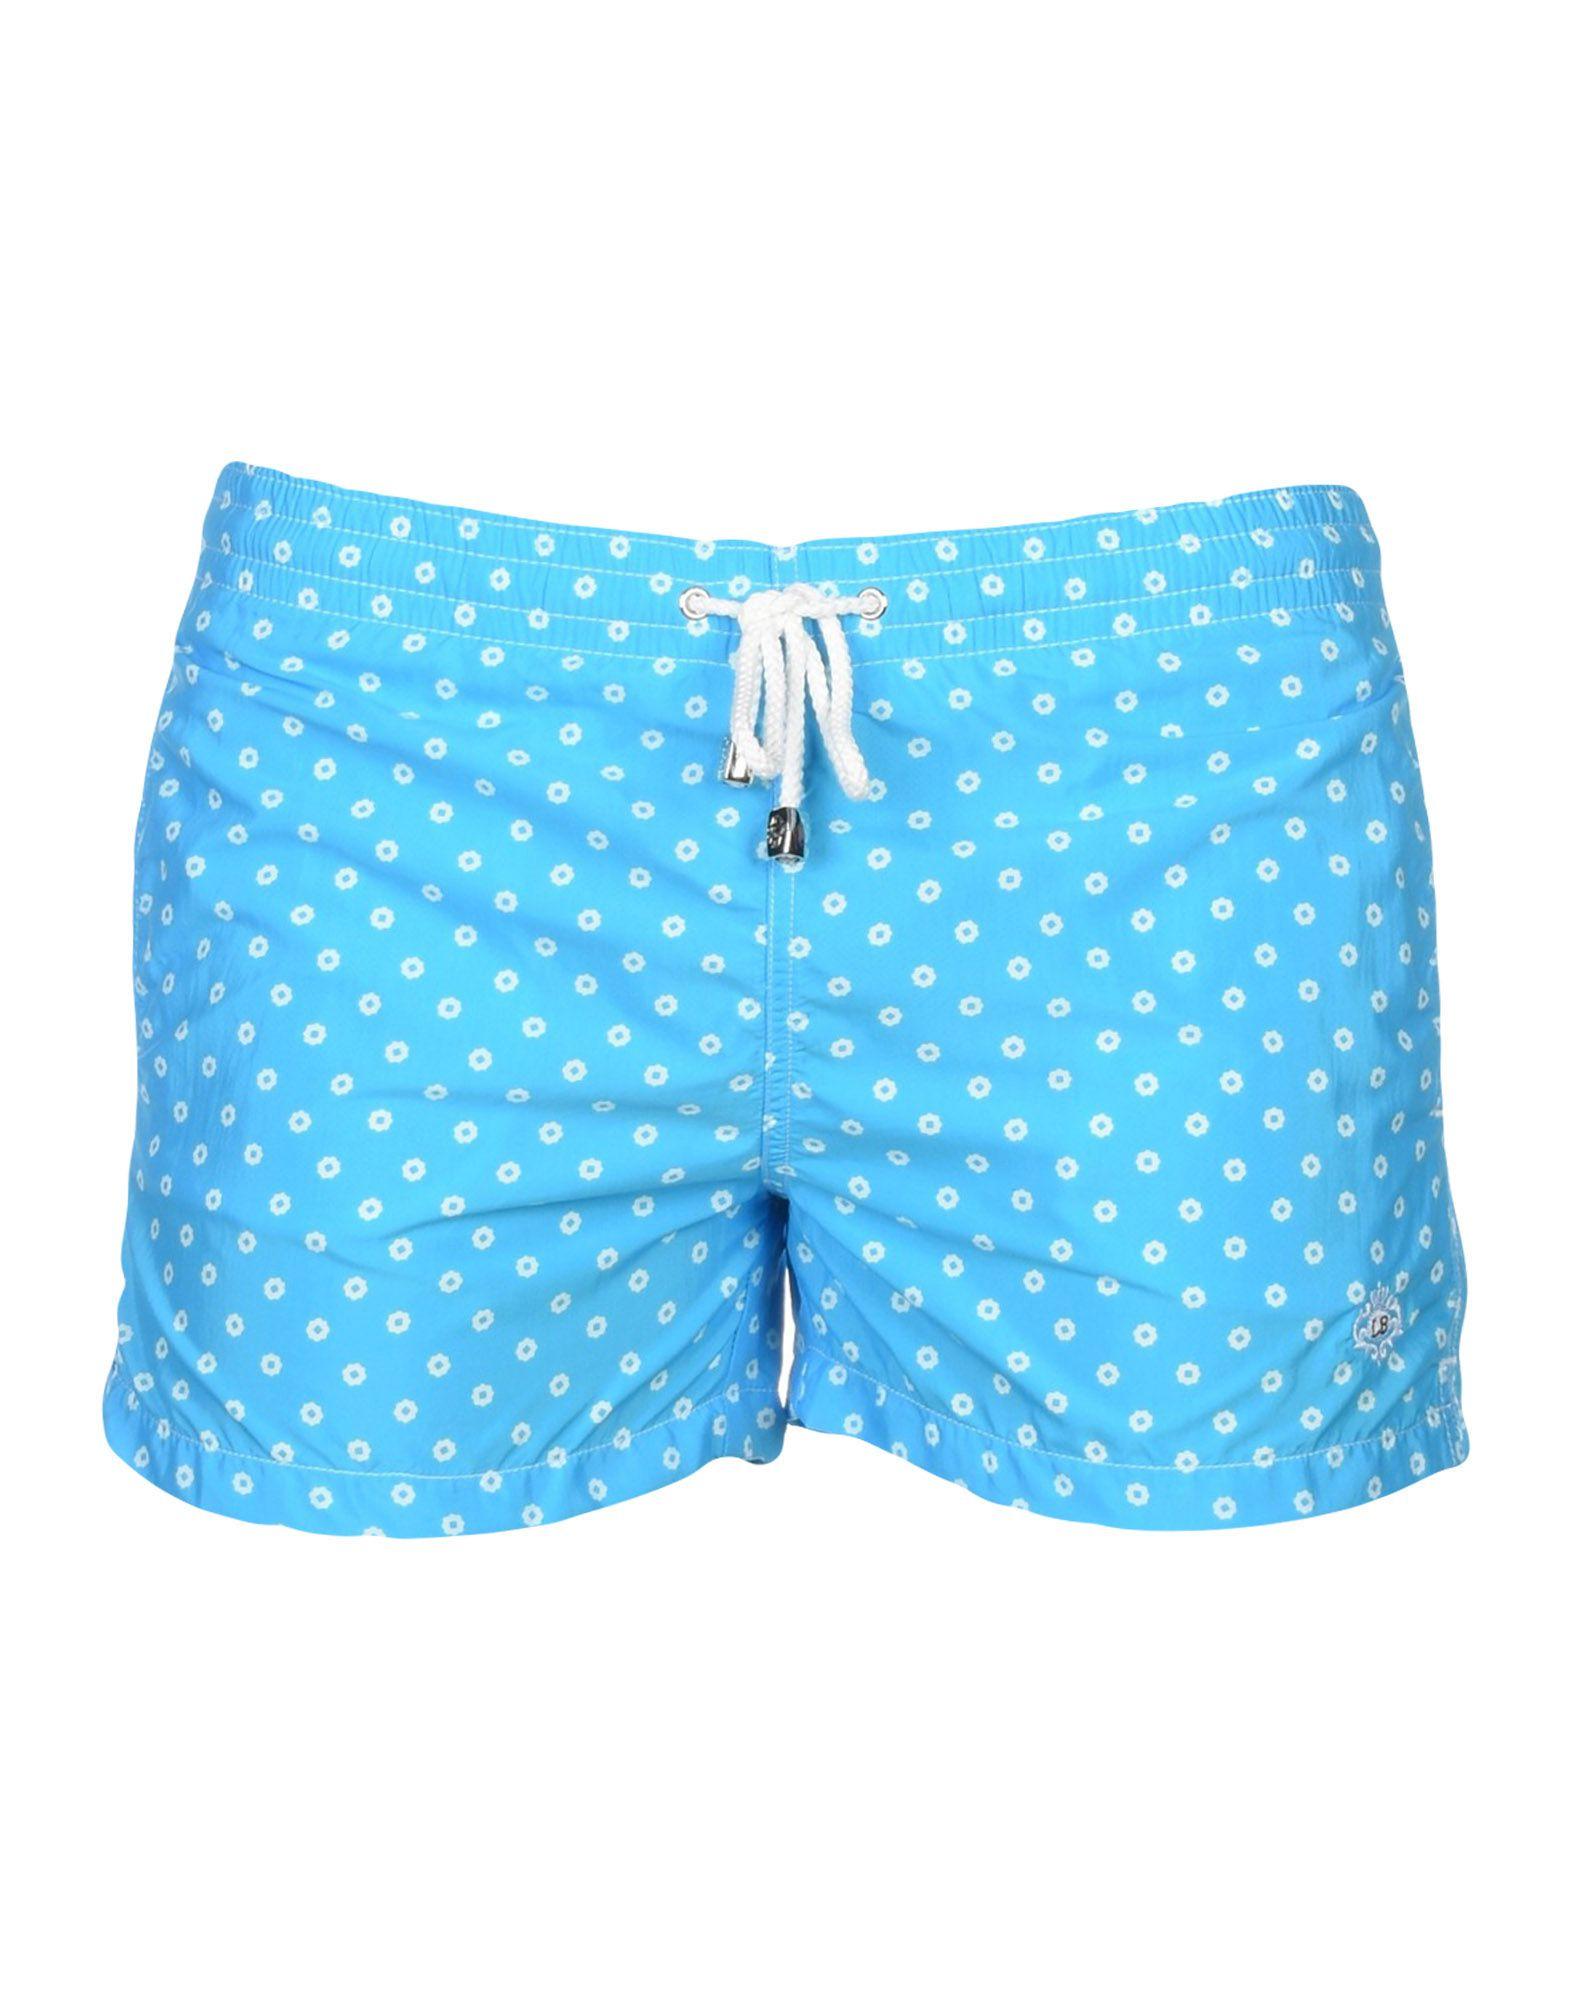 LUIGI BORRELLI NAPOLI Пляжные брюки и шорты пляжные мужские шорты insight reckless youth mid nude black